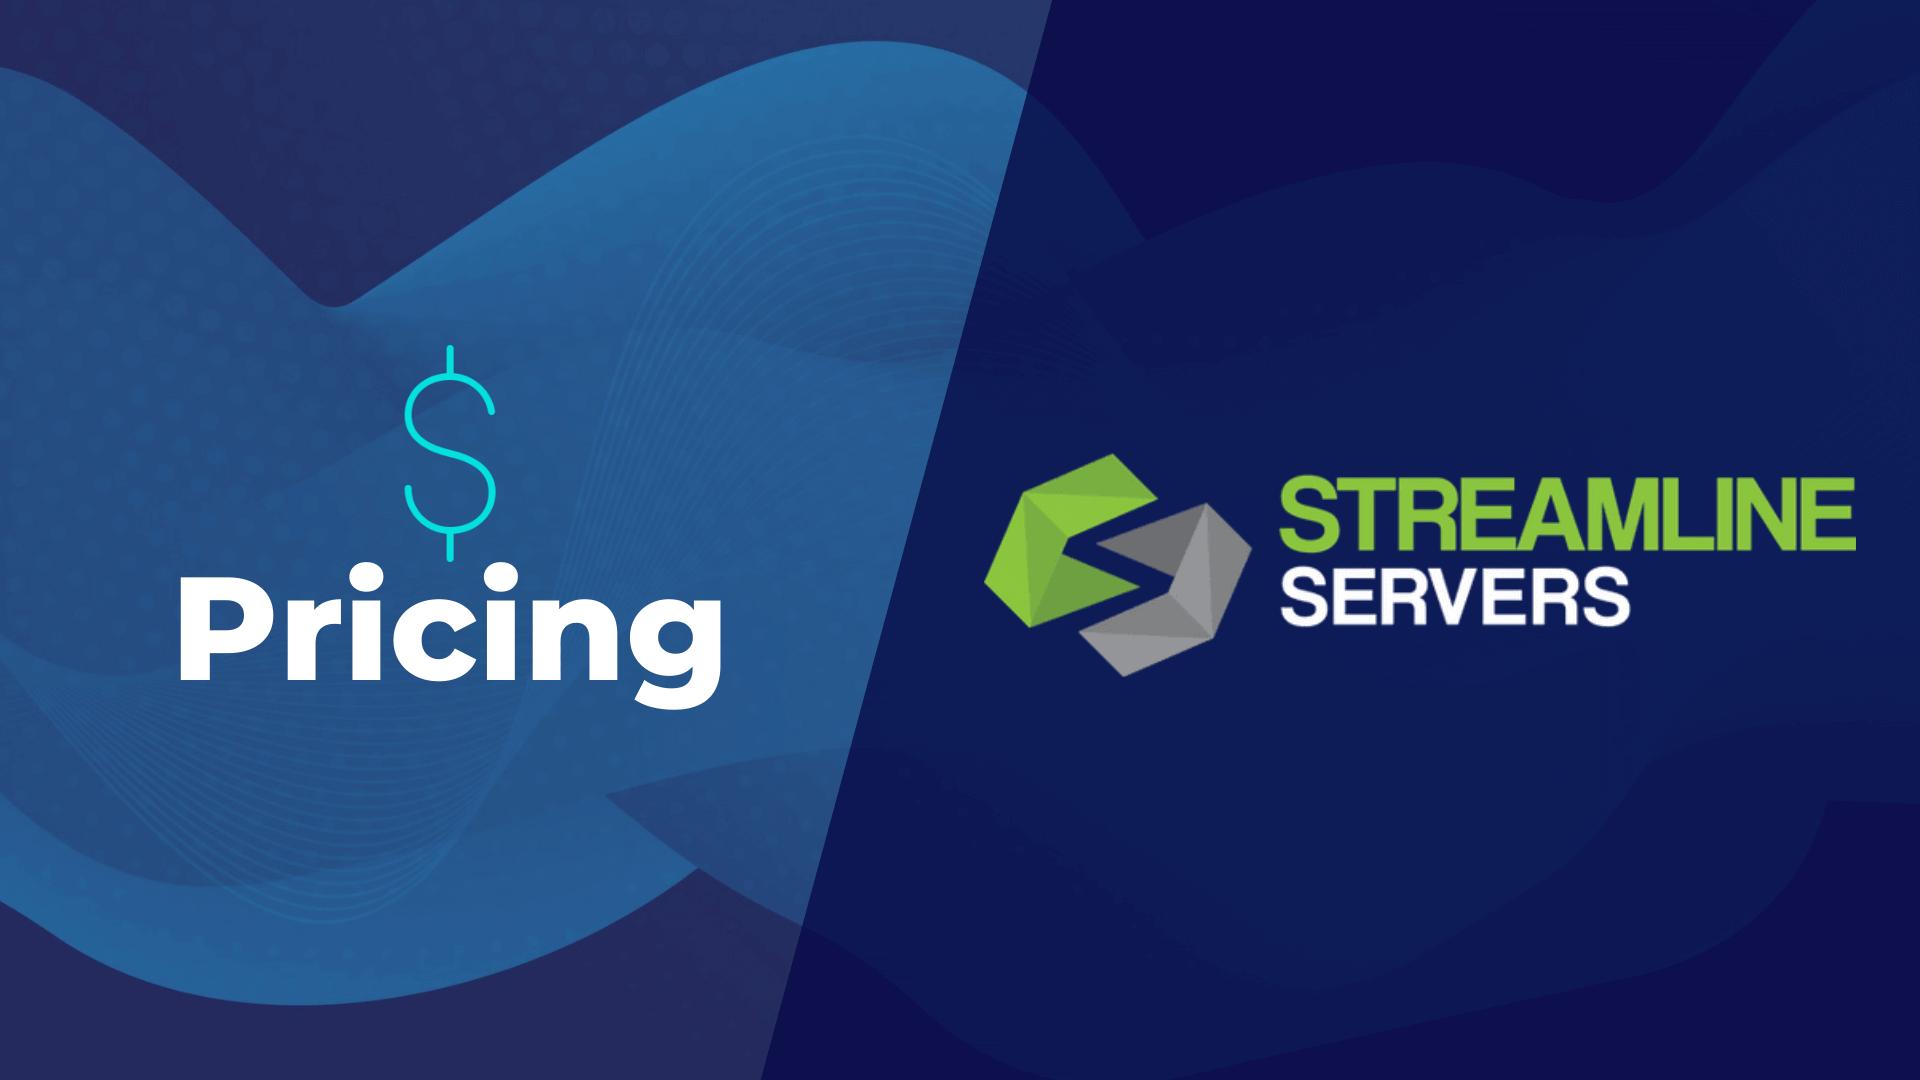 Streamline Servers Pricing